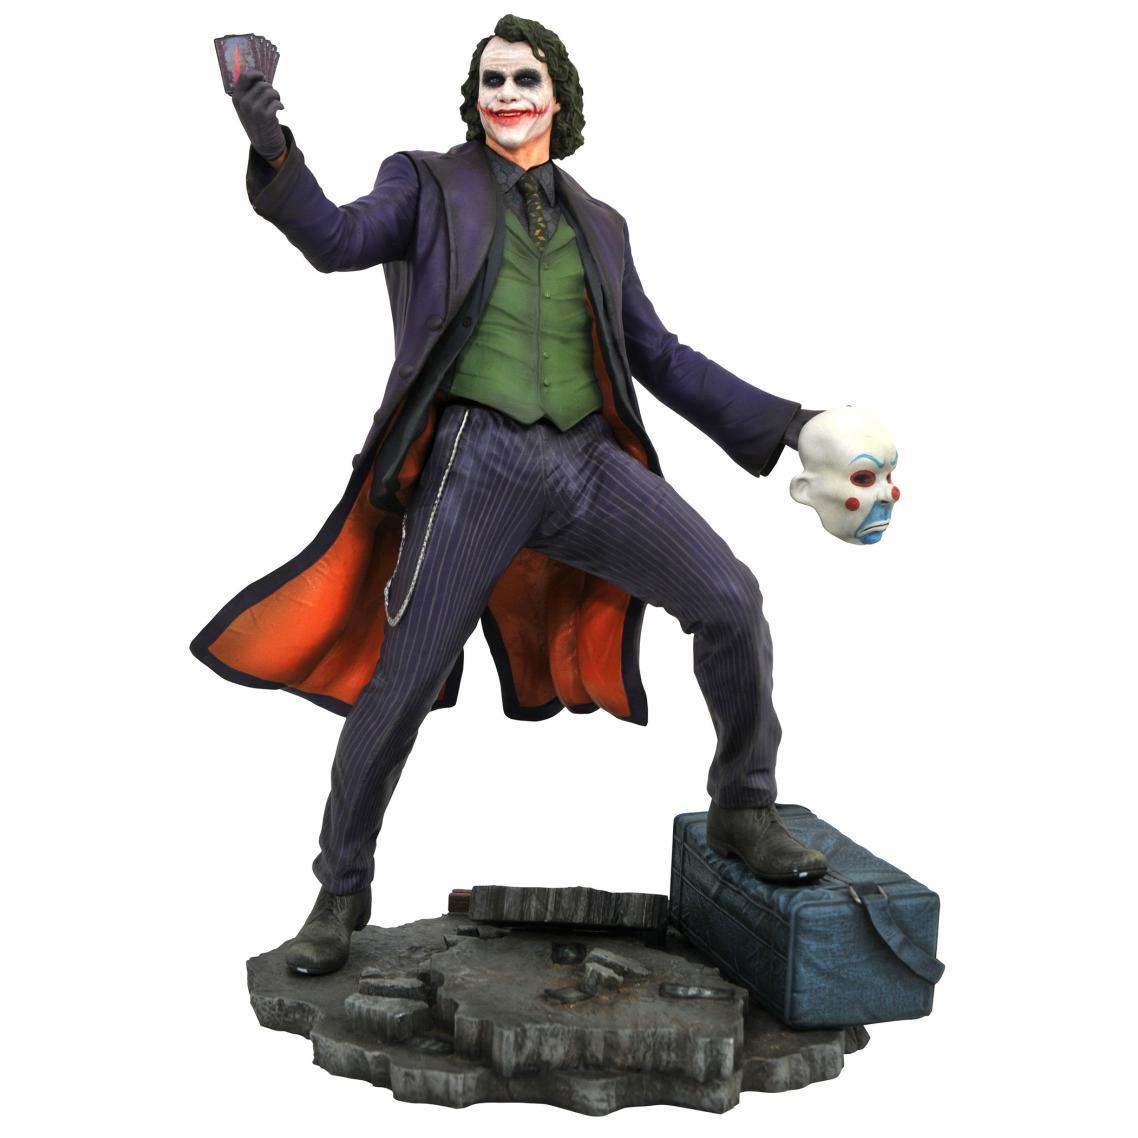 dc gallery batman dark knight movie joker pvc figure - joker gallery 800x1138 - DC GALLERY BATMAN DARK KNIGHT MOVIE JOKER PVC FIGURE – S3